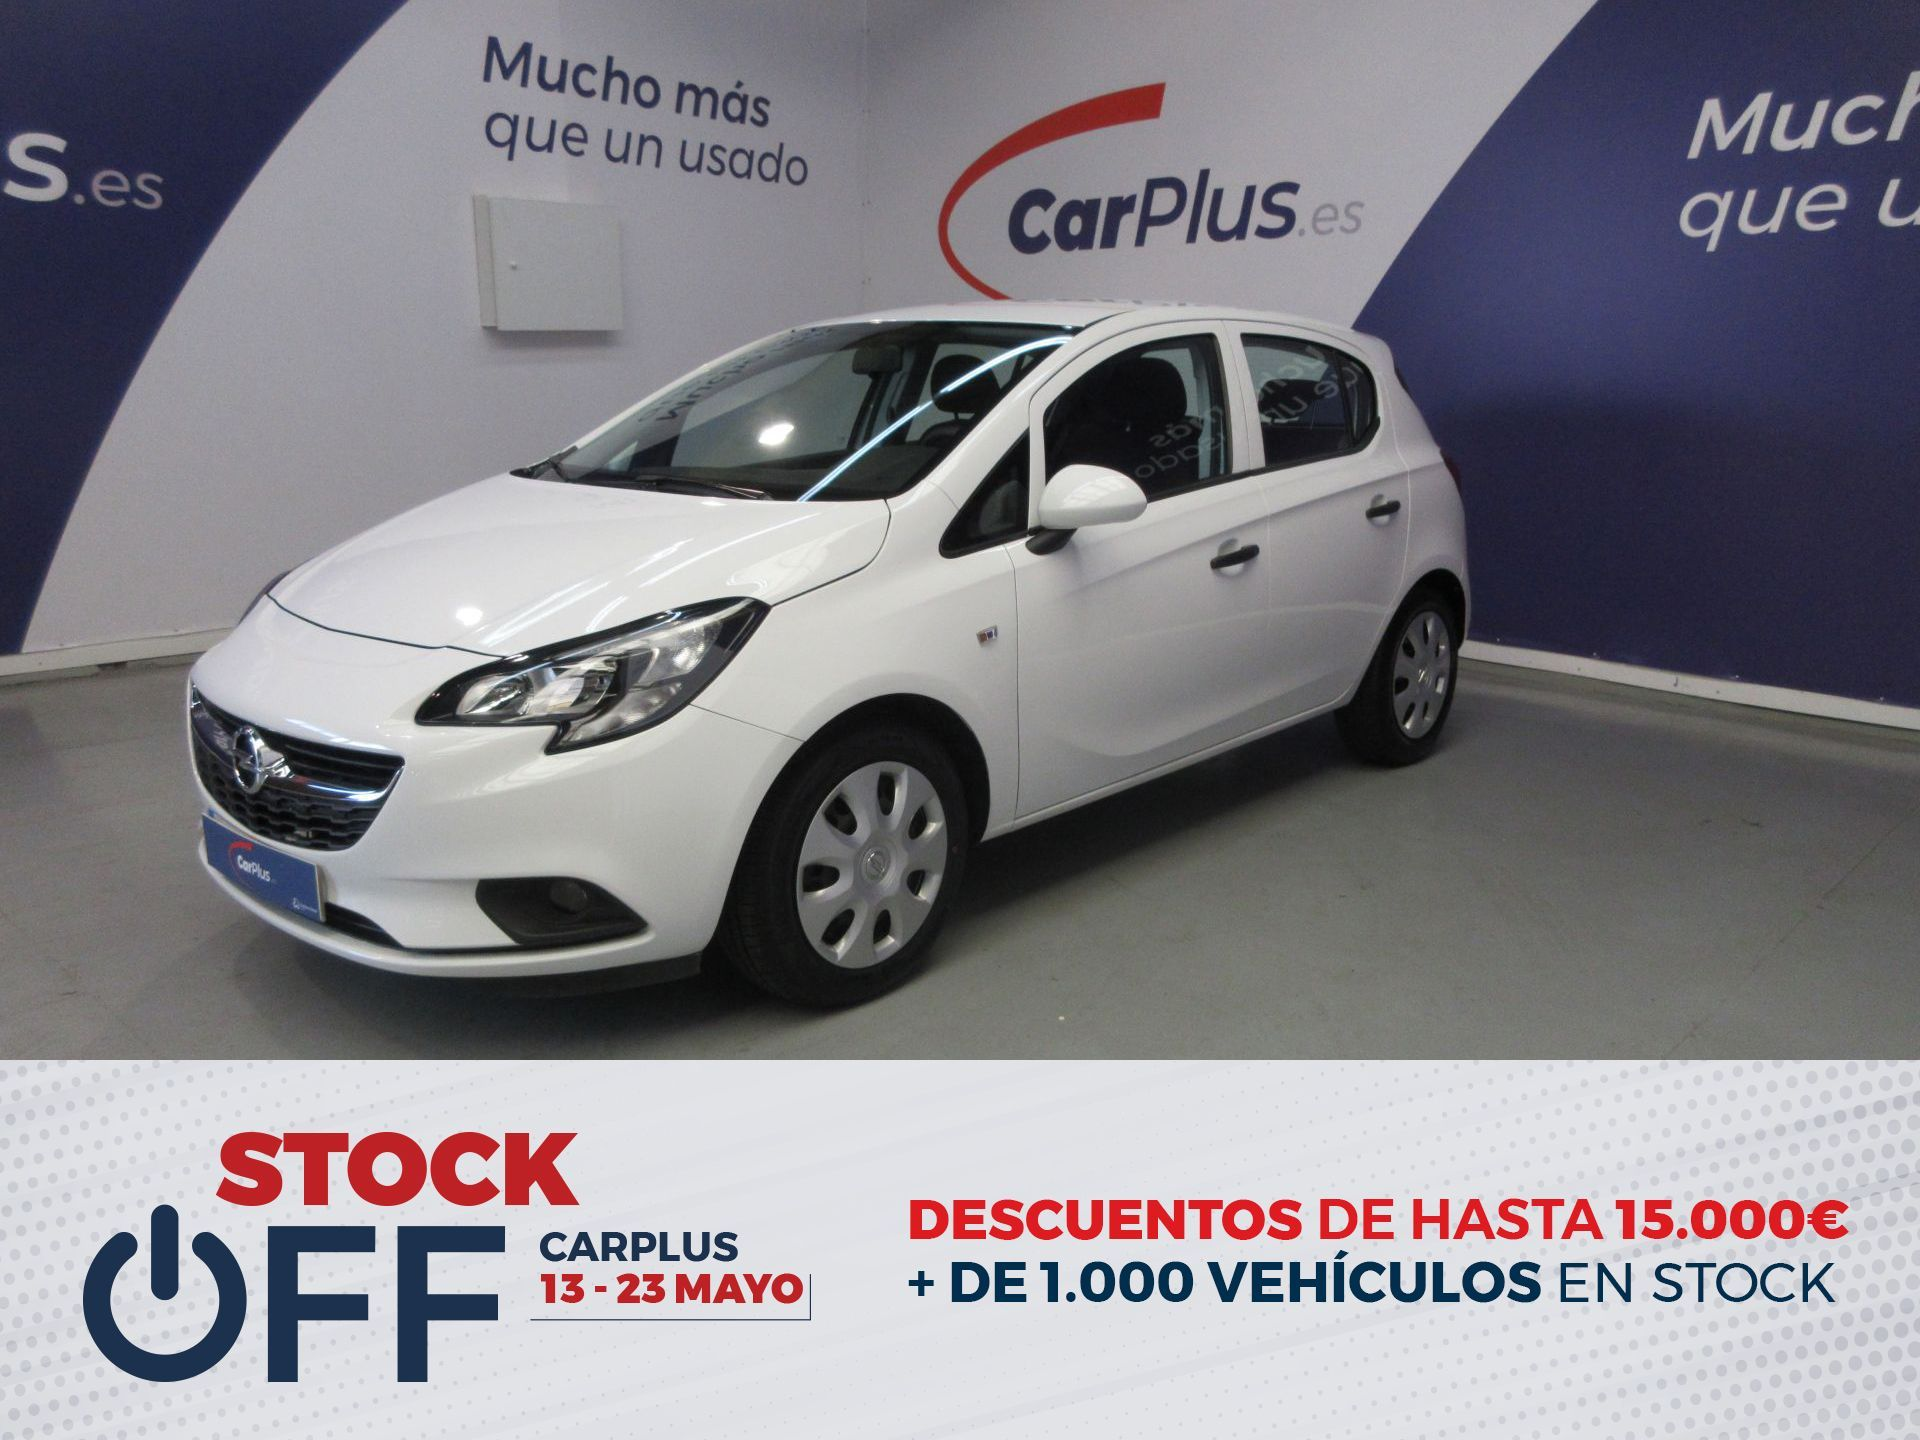 Opel Corsa ocasión segunda mano 2018 Gasolina por 8.990€ en Madrid